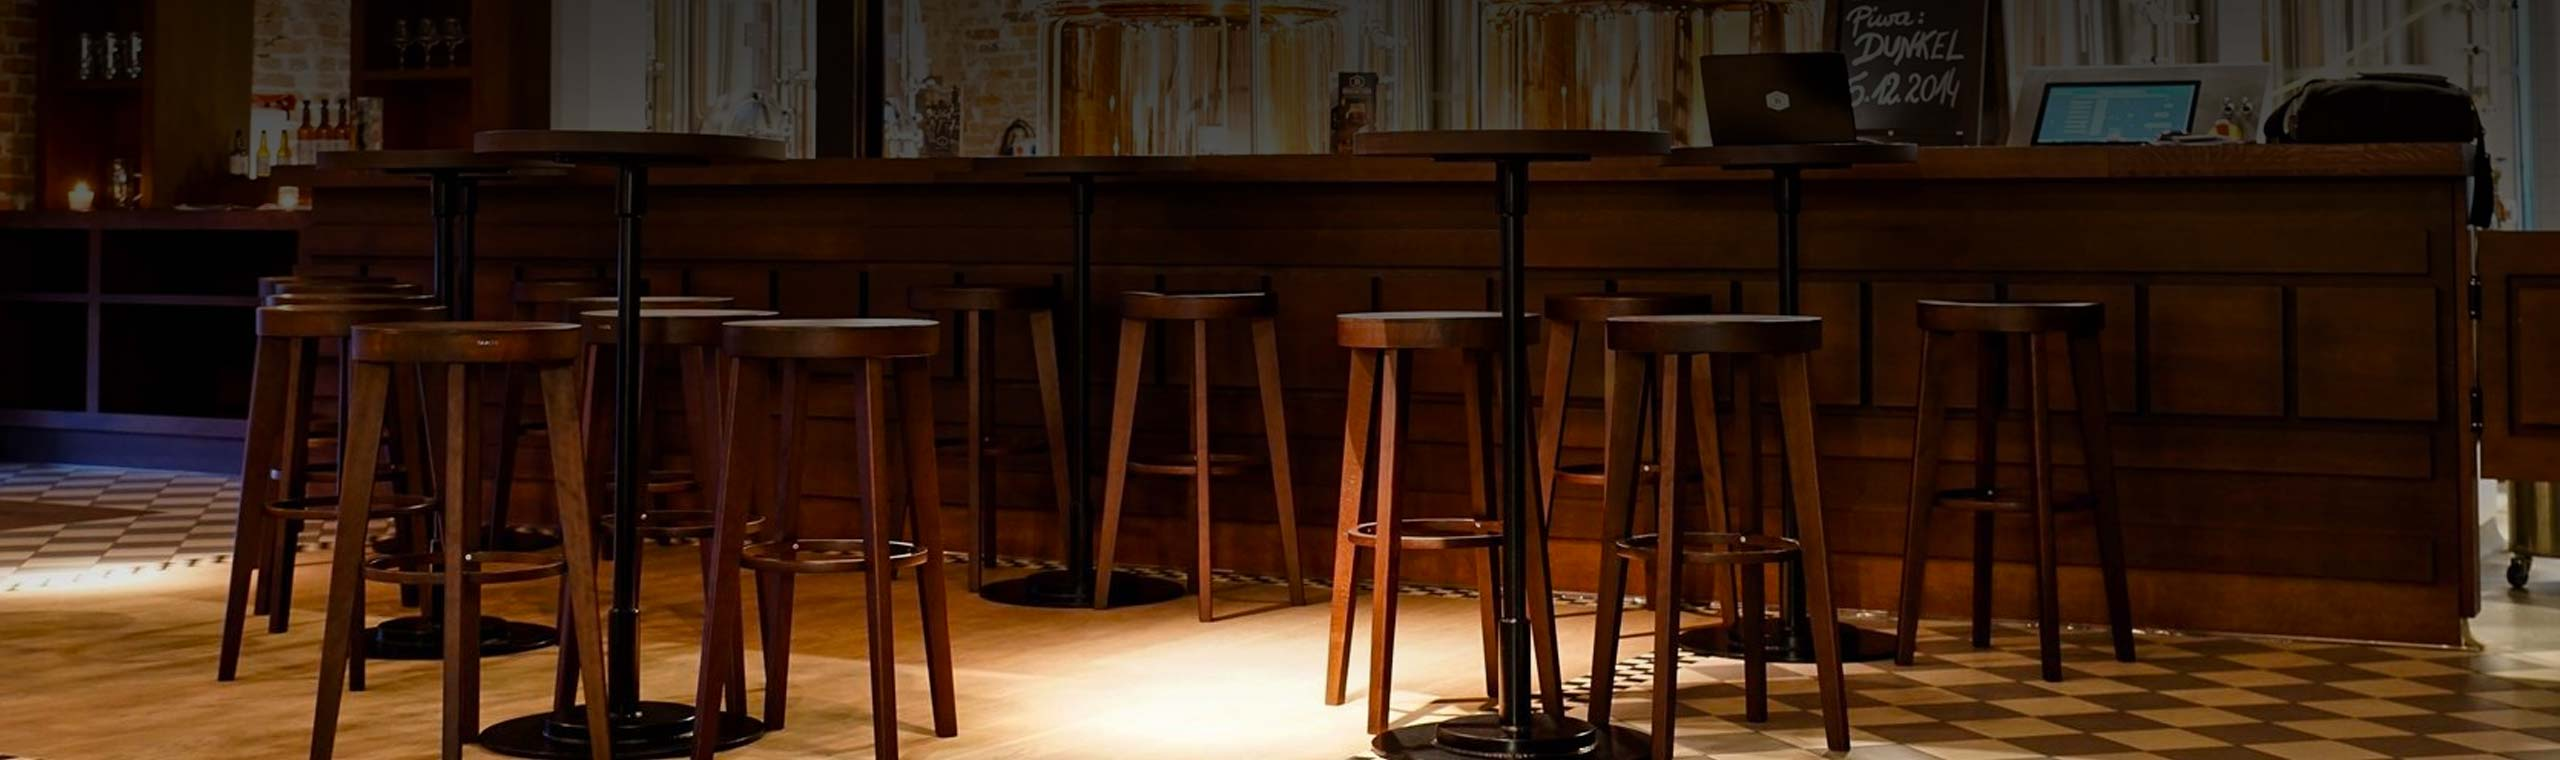 Hospitality Pub Furniture